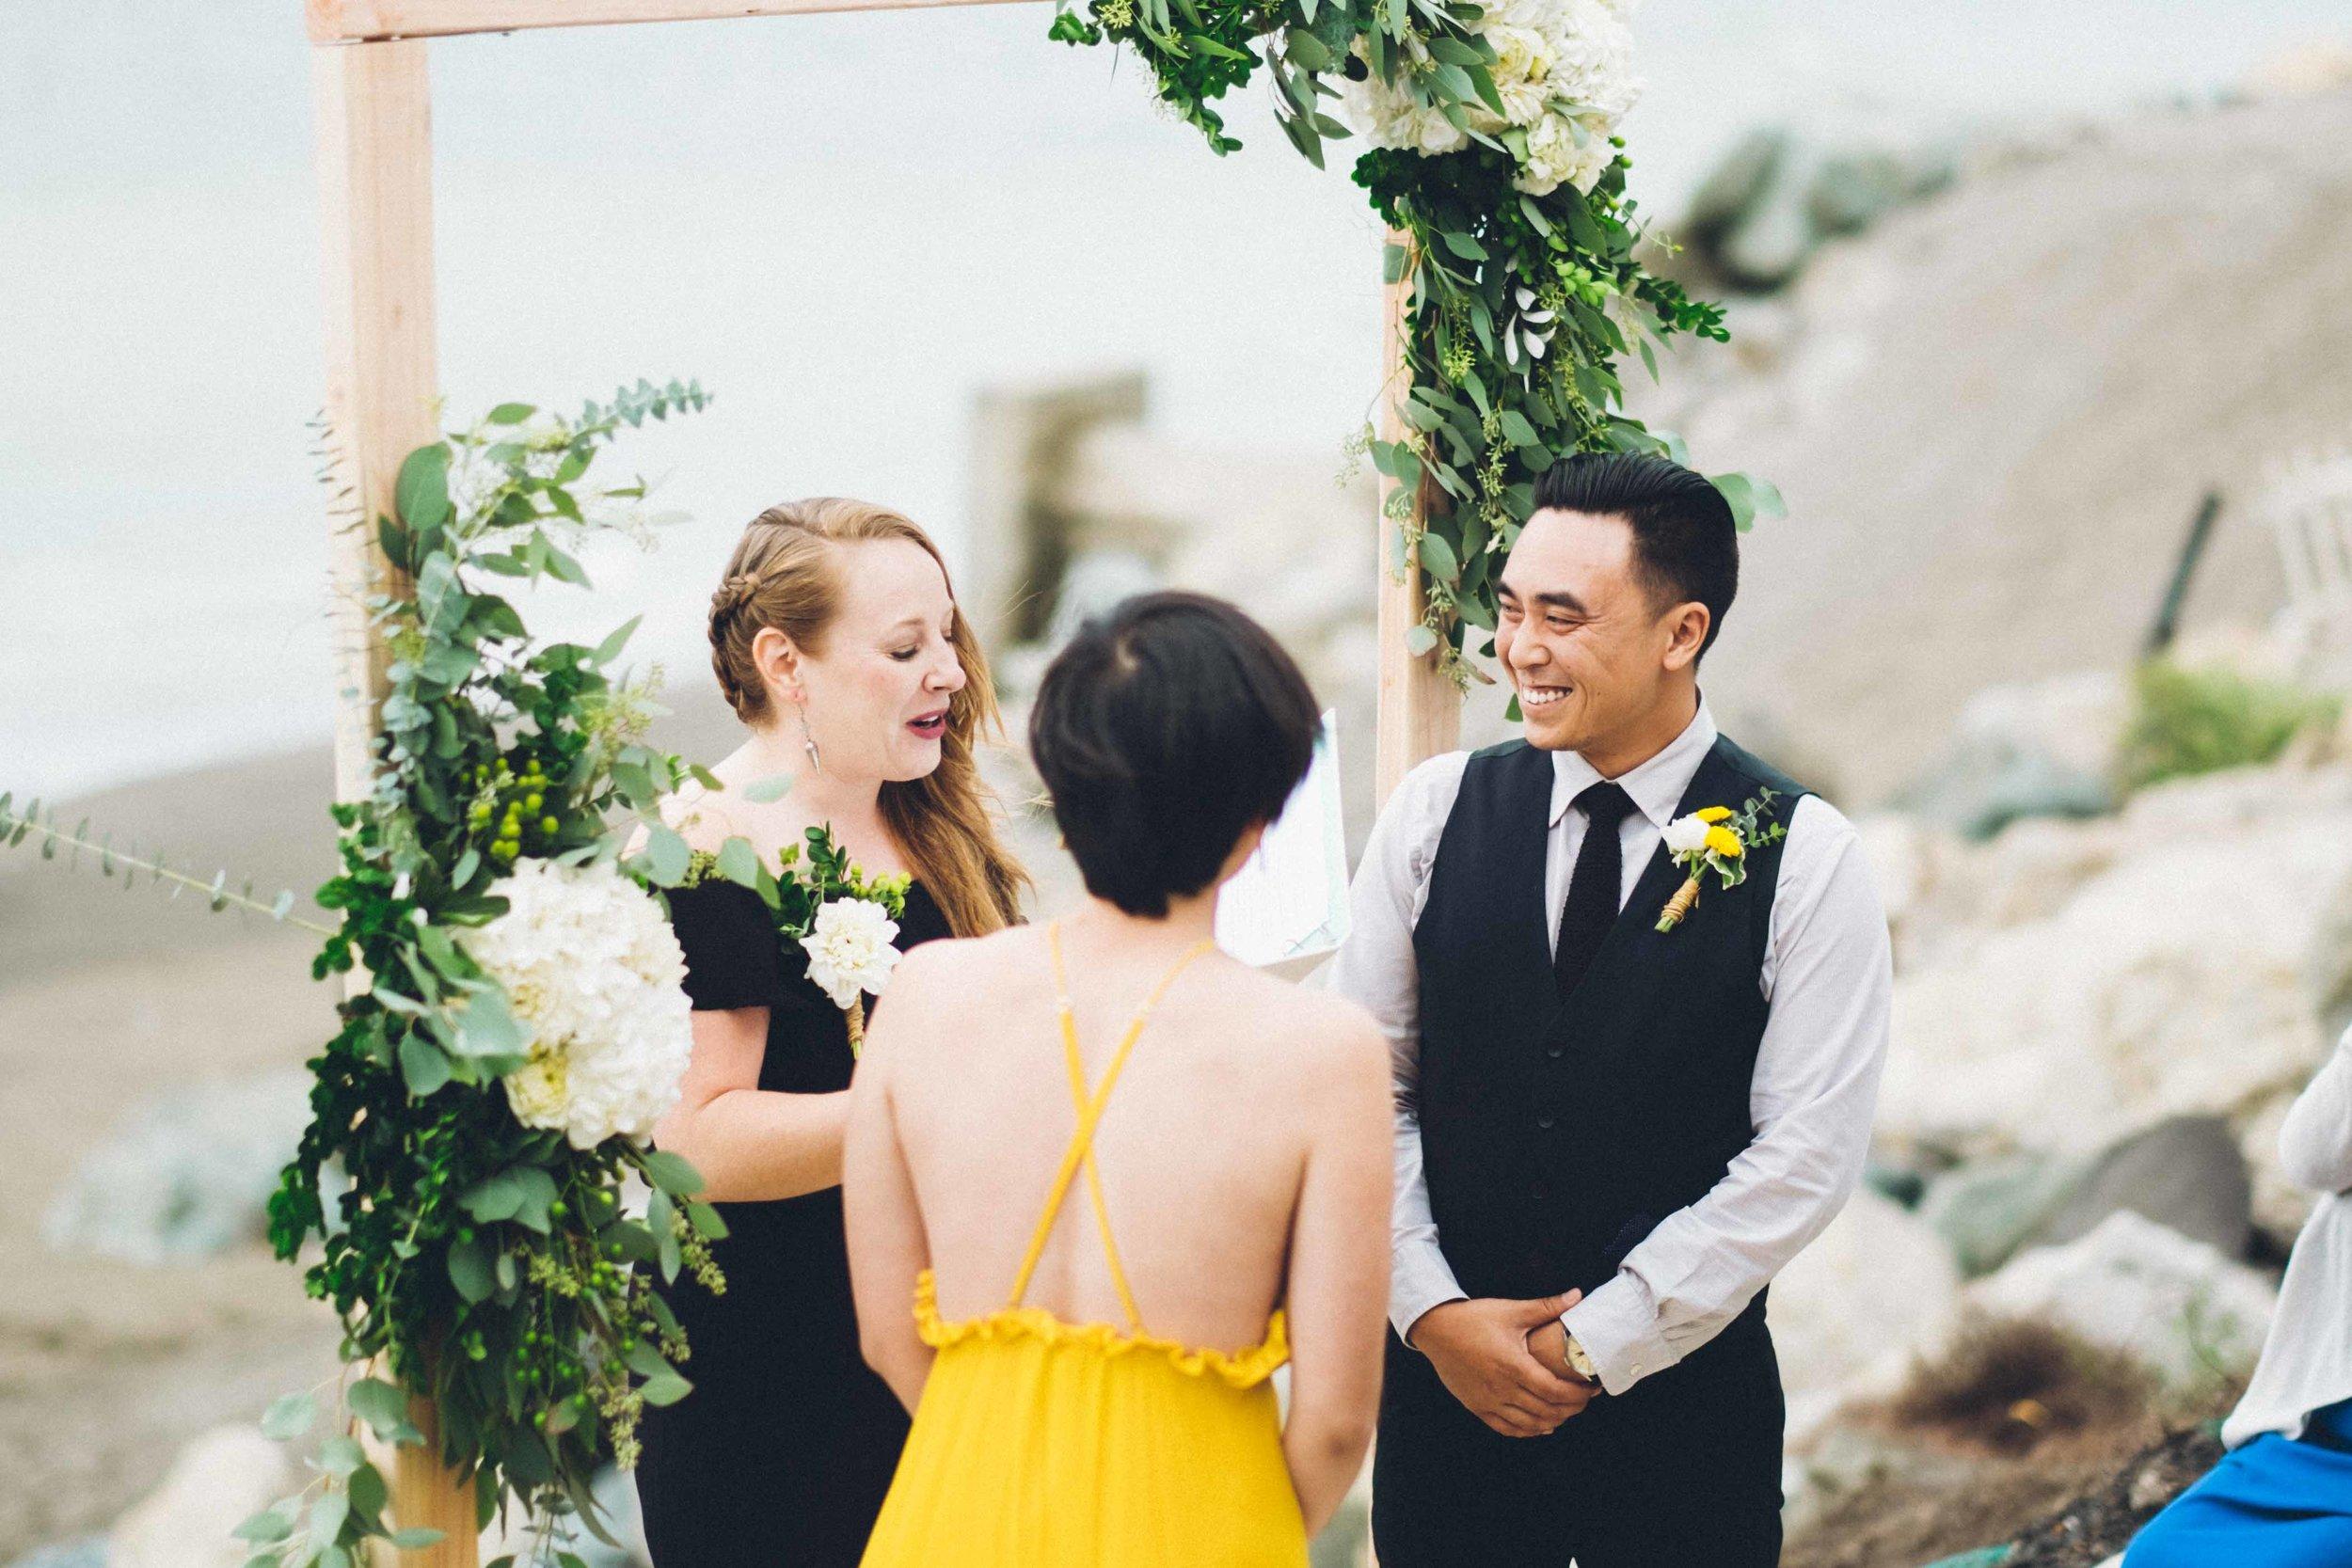 c-l-wedding-russell-rabanal-6583.jpg